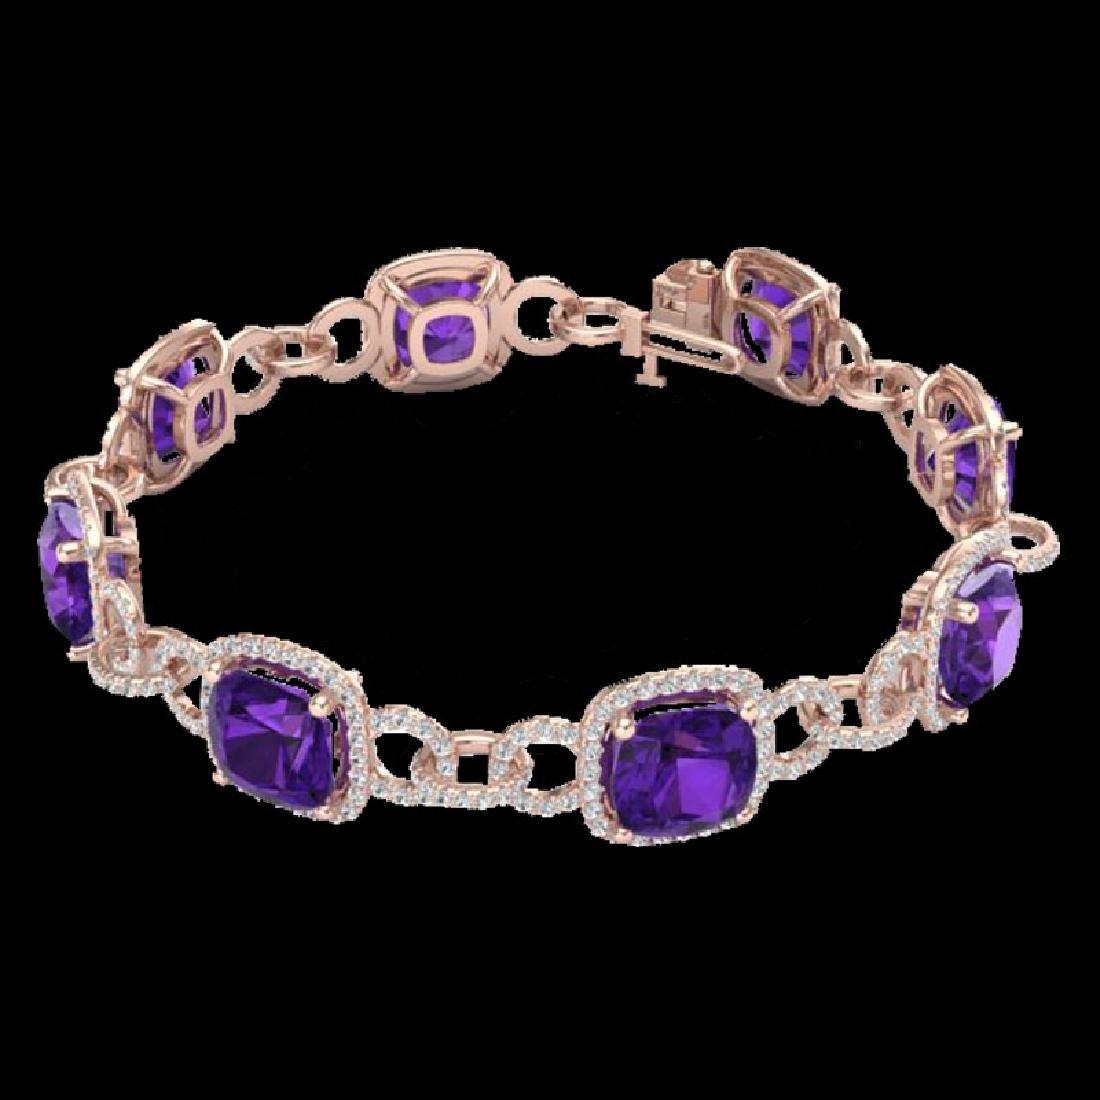 30 CTW Amethyst & Micro VS/SI Diamond Bracelet 14K Rose - 2